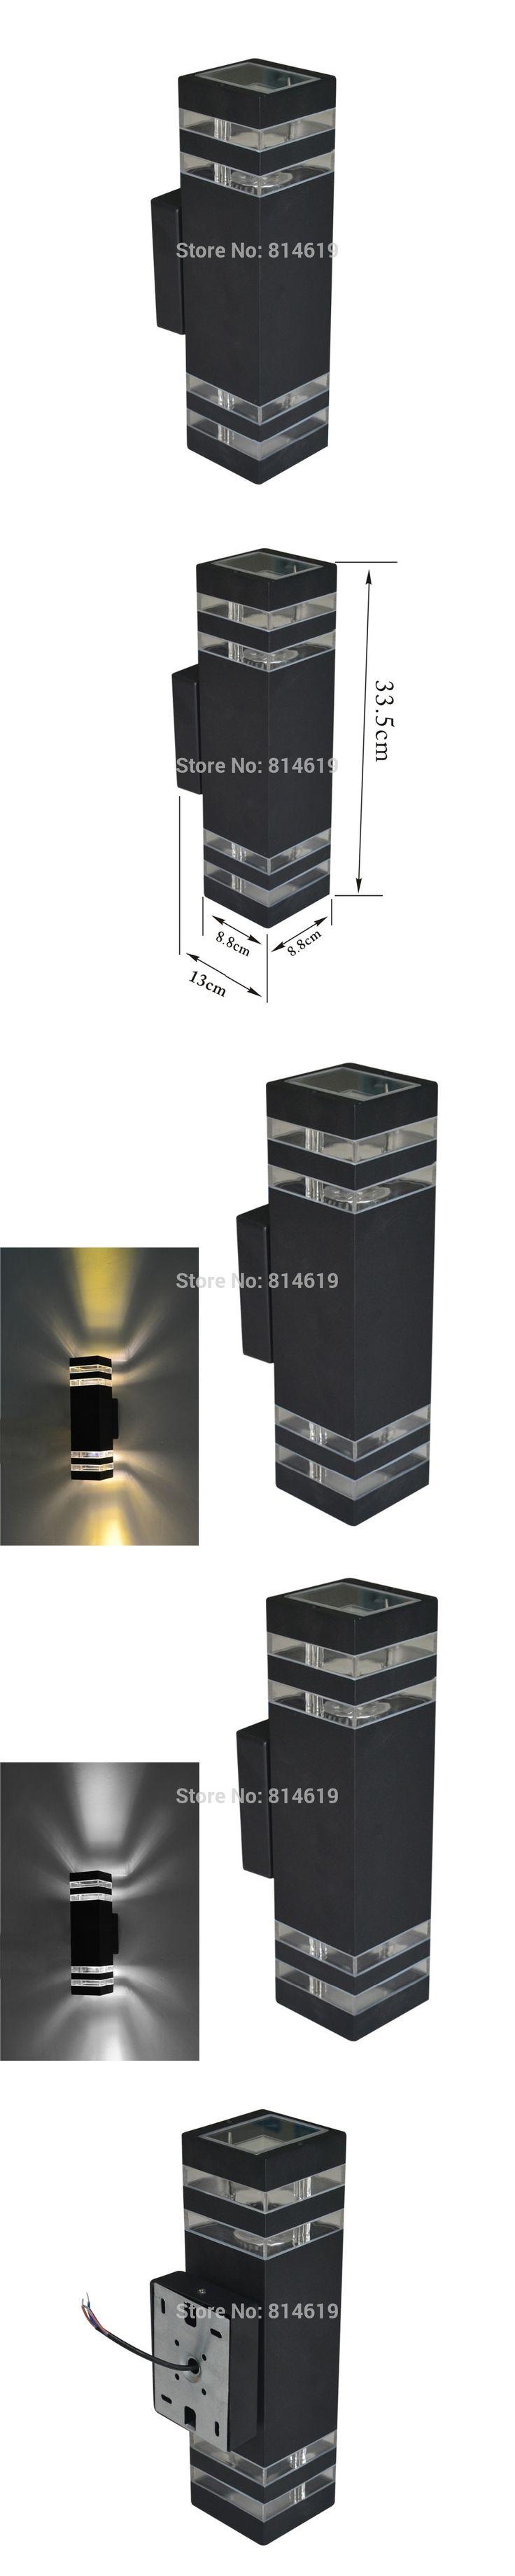 modern outdoor wall lighting / outdoor wall lamp / LED Porch Lights / waterproof  IP65 lamp outdoor lighting wall lamps